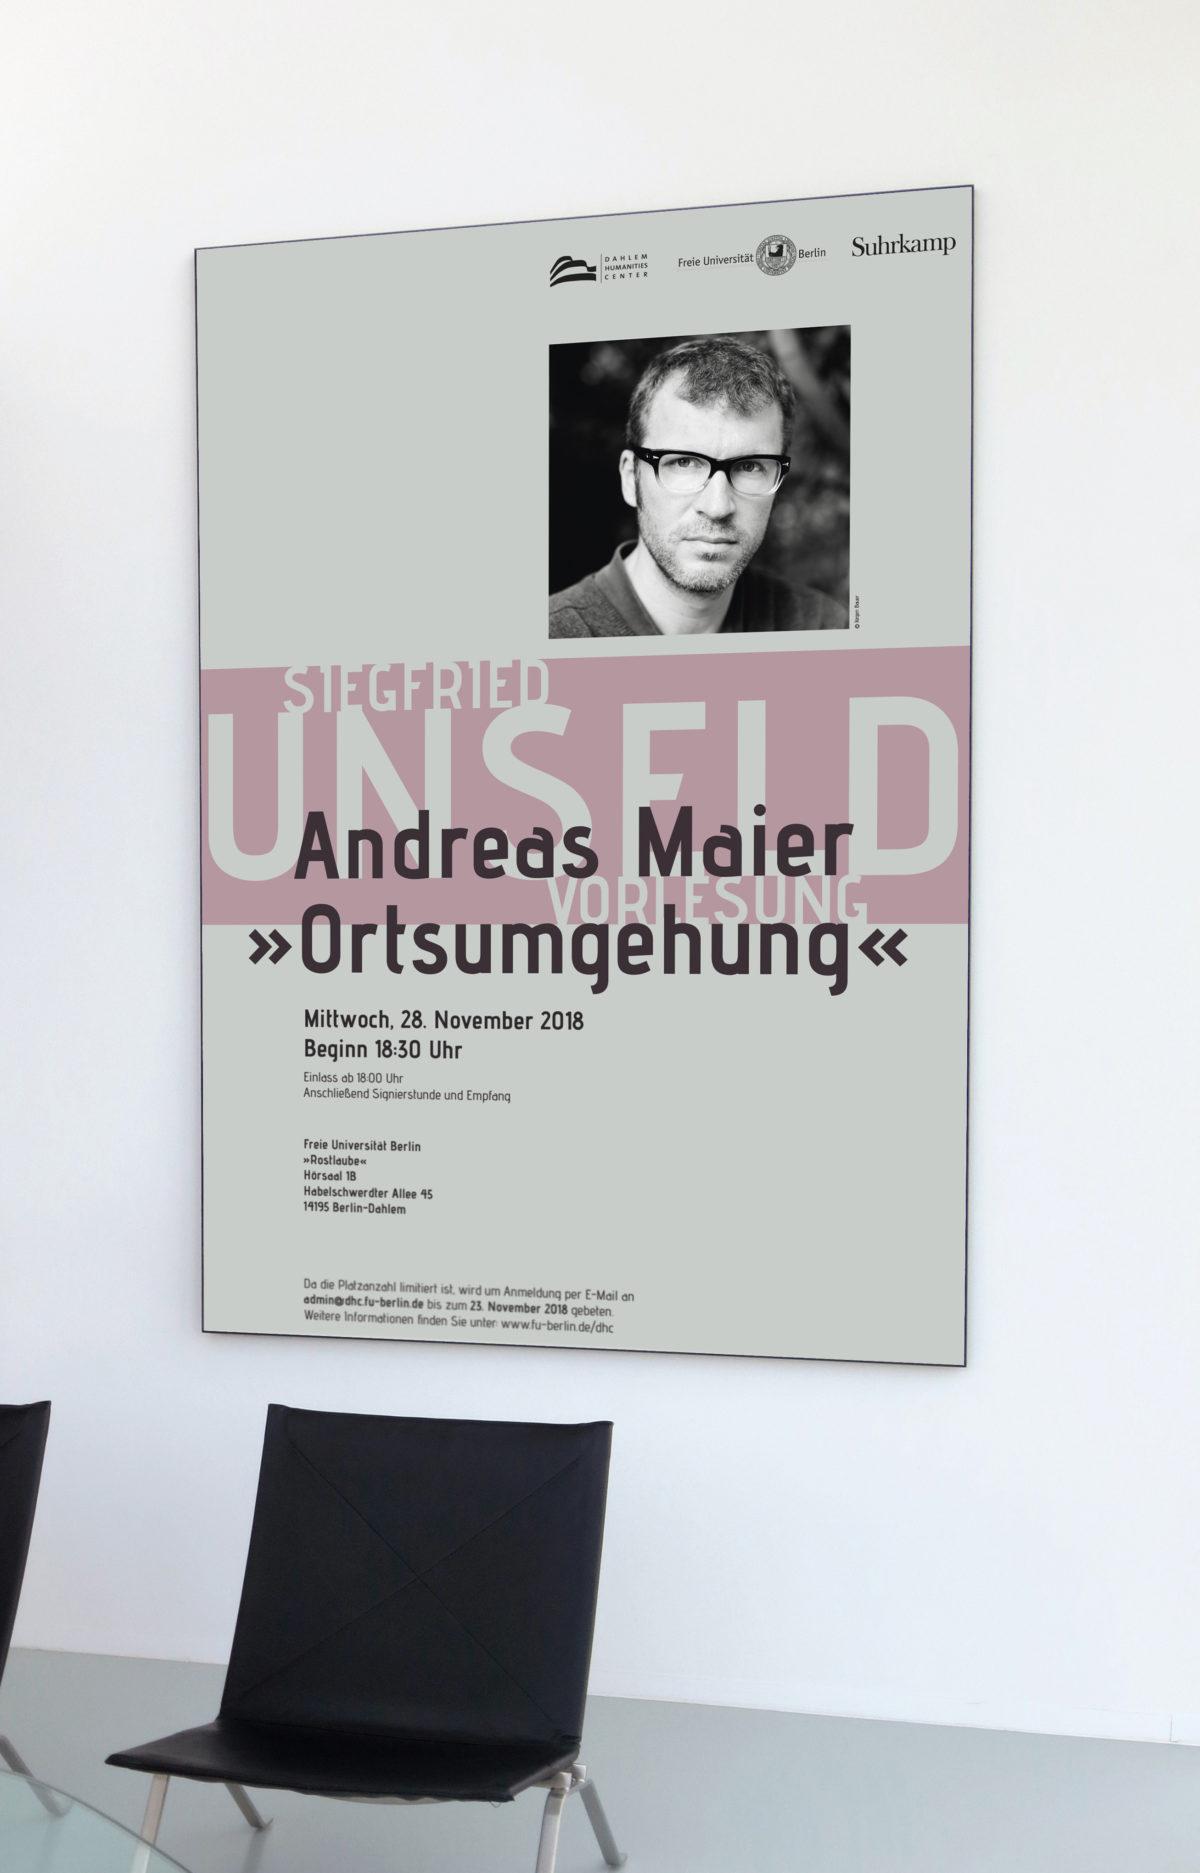 Plakat, Unseld-Vorlesung mit Andreas Maier, Dahlem Humanities Center, Freie Universität Berlin